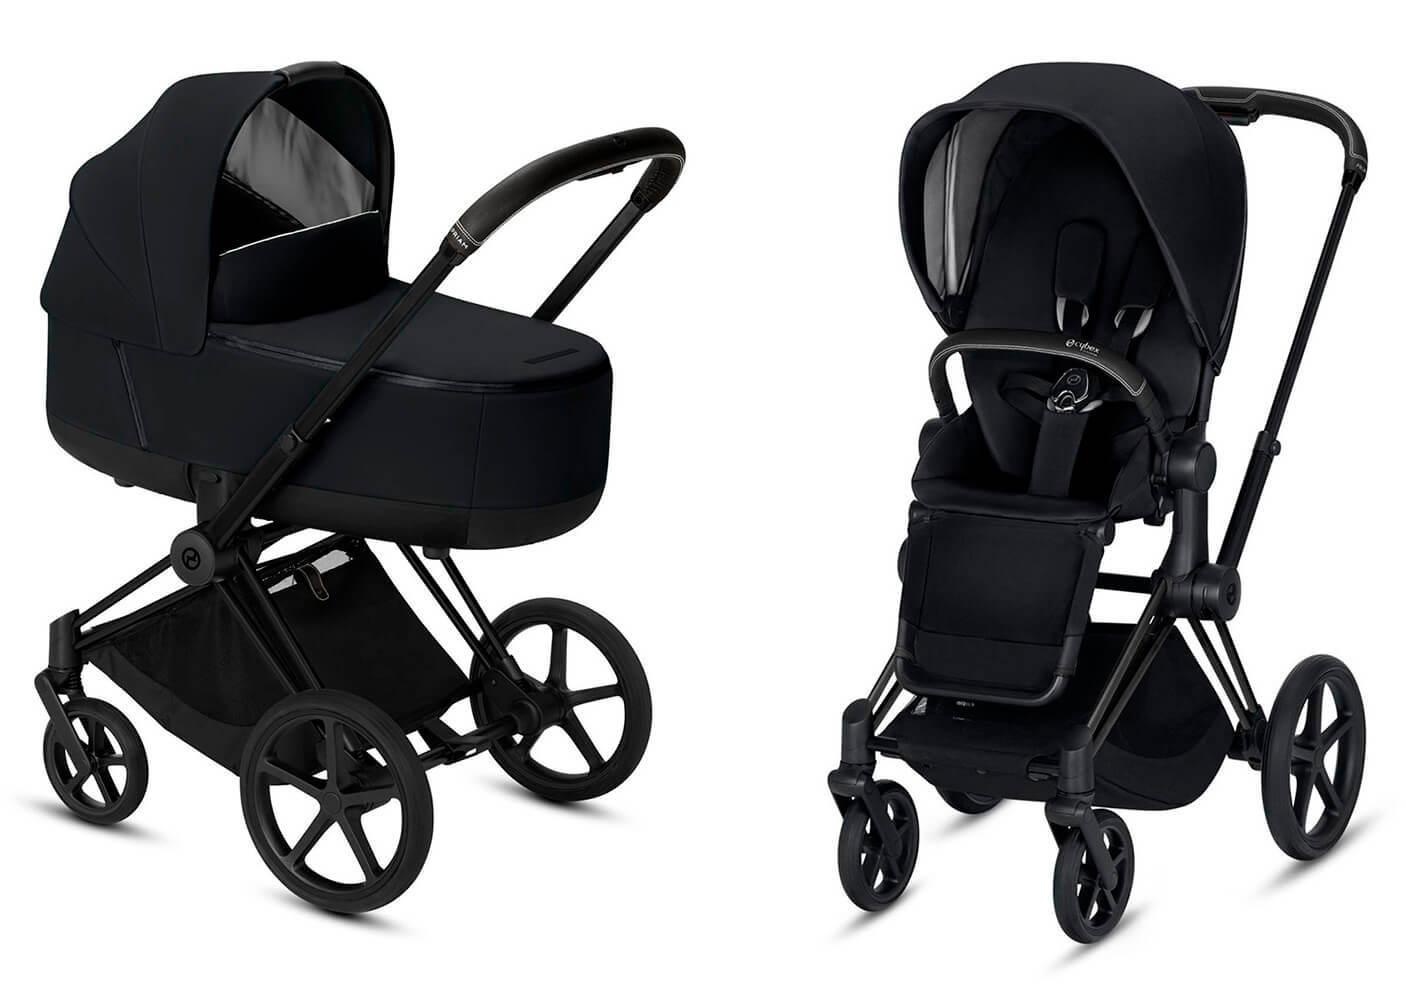 Цвета Cybex Priam 2 в 1 Детская коляска Cybex Priam III 2 в 1 Premium Black шасси Matt Black cybex-priam-iii-2-in-1-premium-black-matt-black.jpg